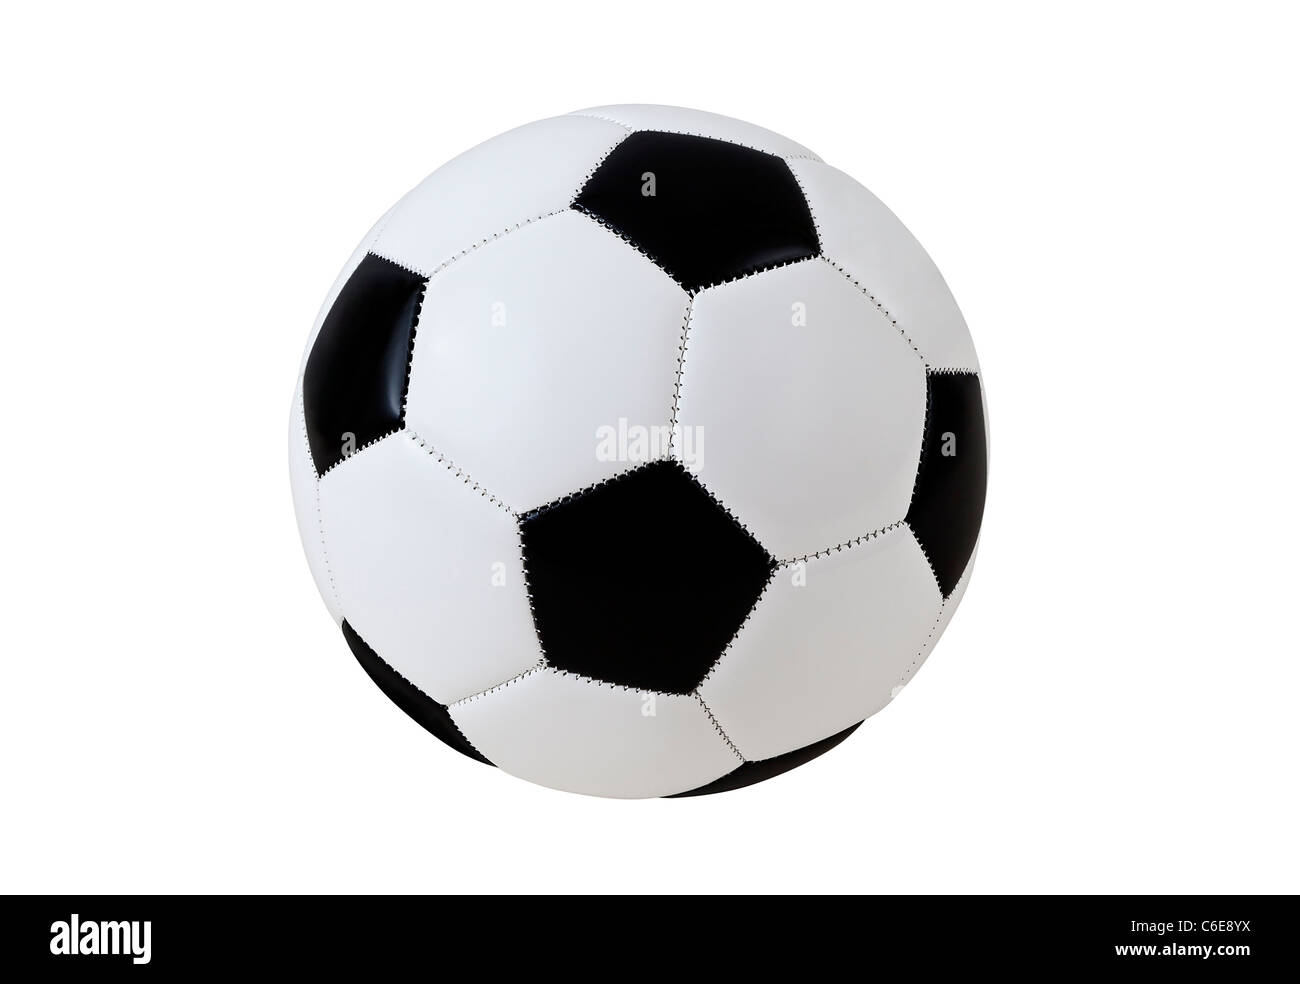 Fußball mit Clipping Path Stockbild